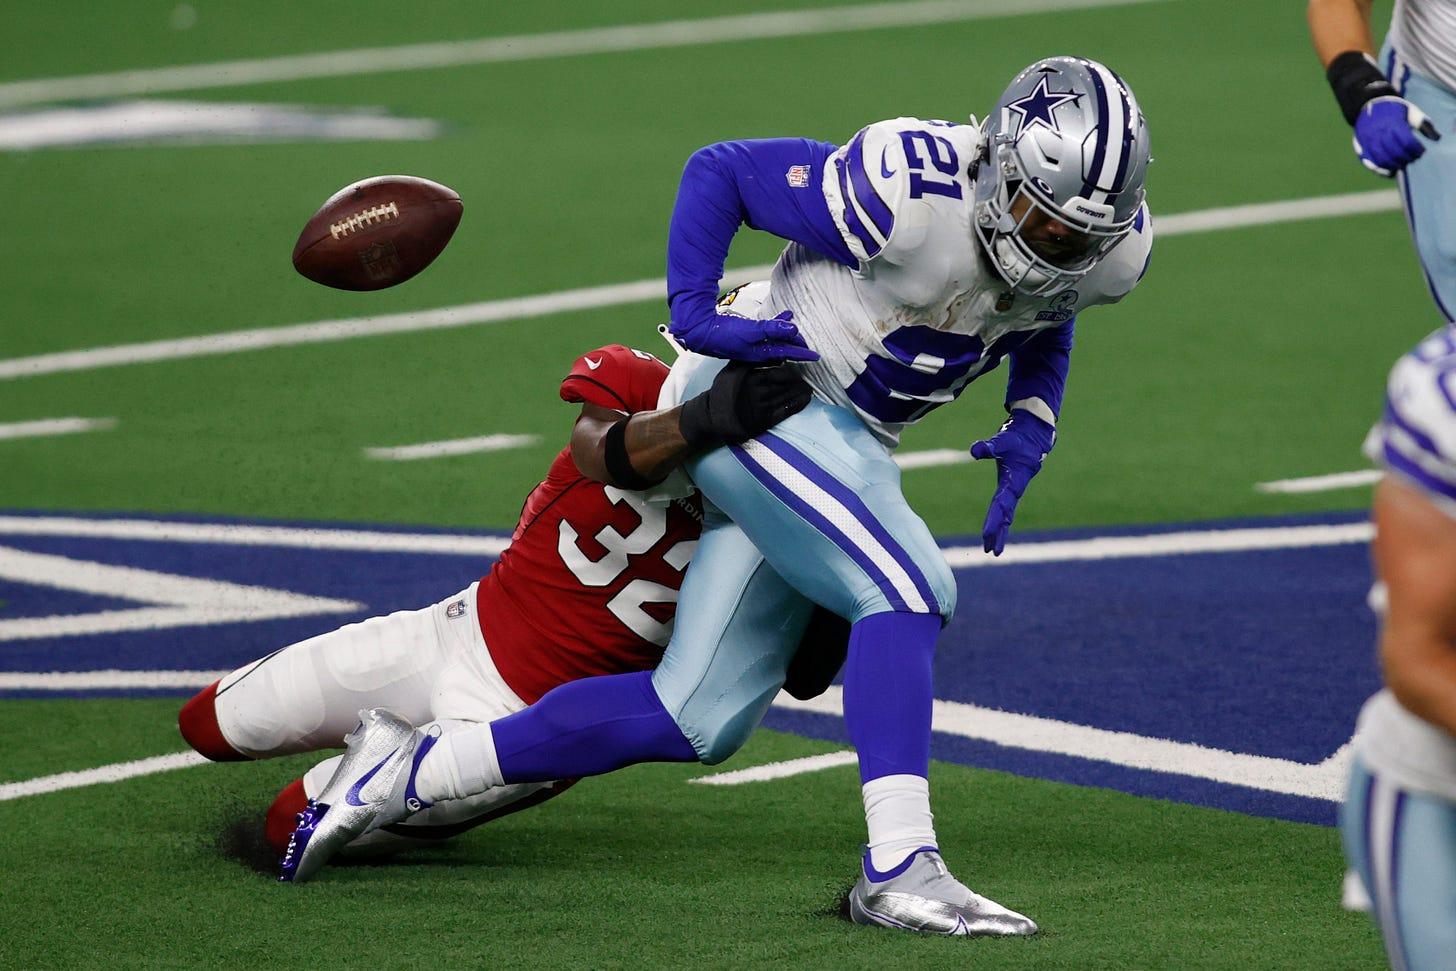 Dallas Cowboys: Ezekiel Elliott fumbles for words after loss to Cards